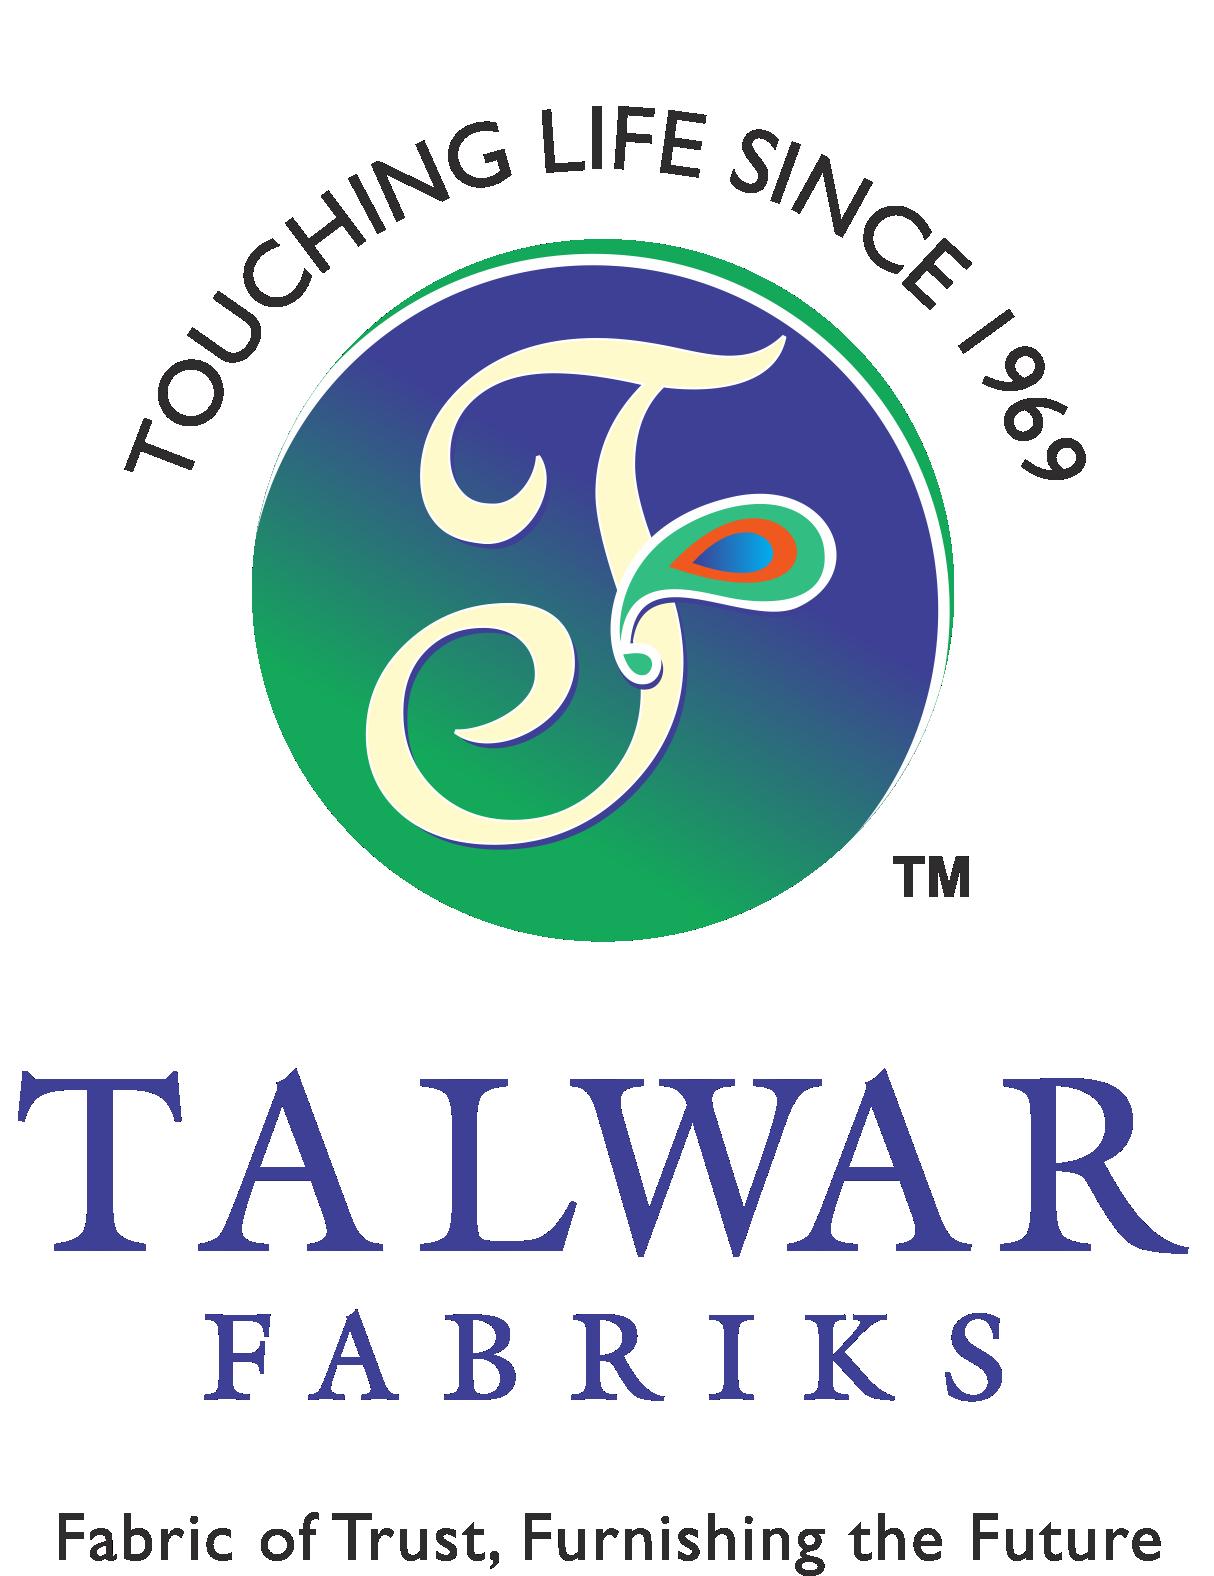 Talwar Fabrics